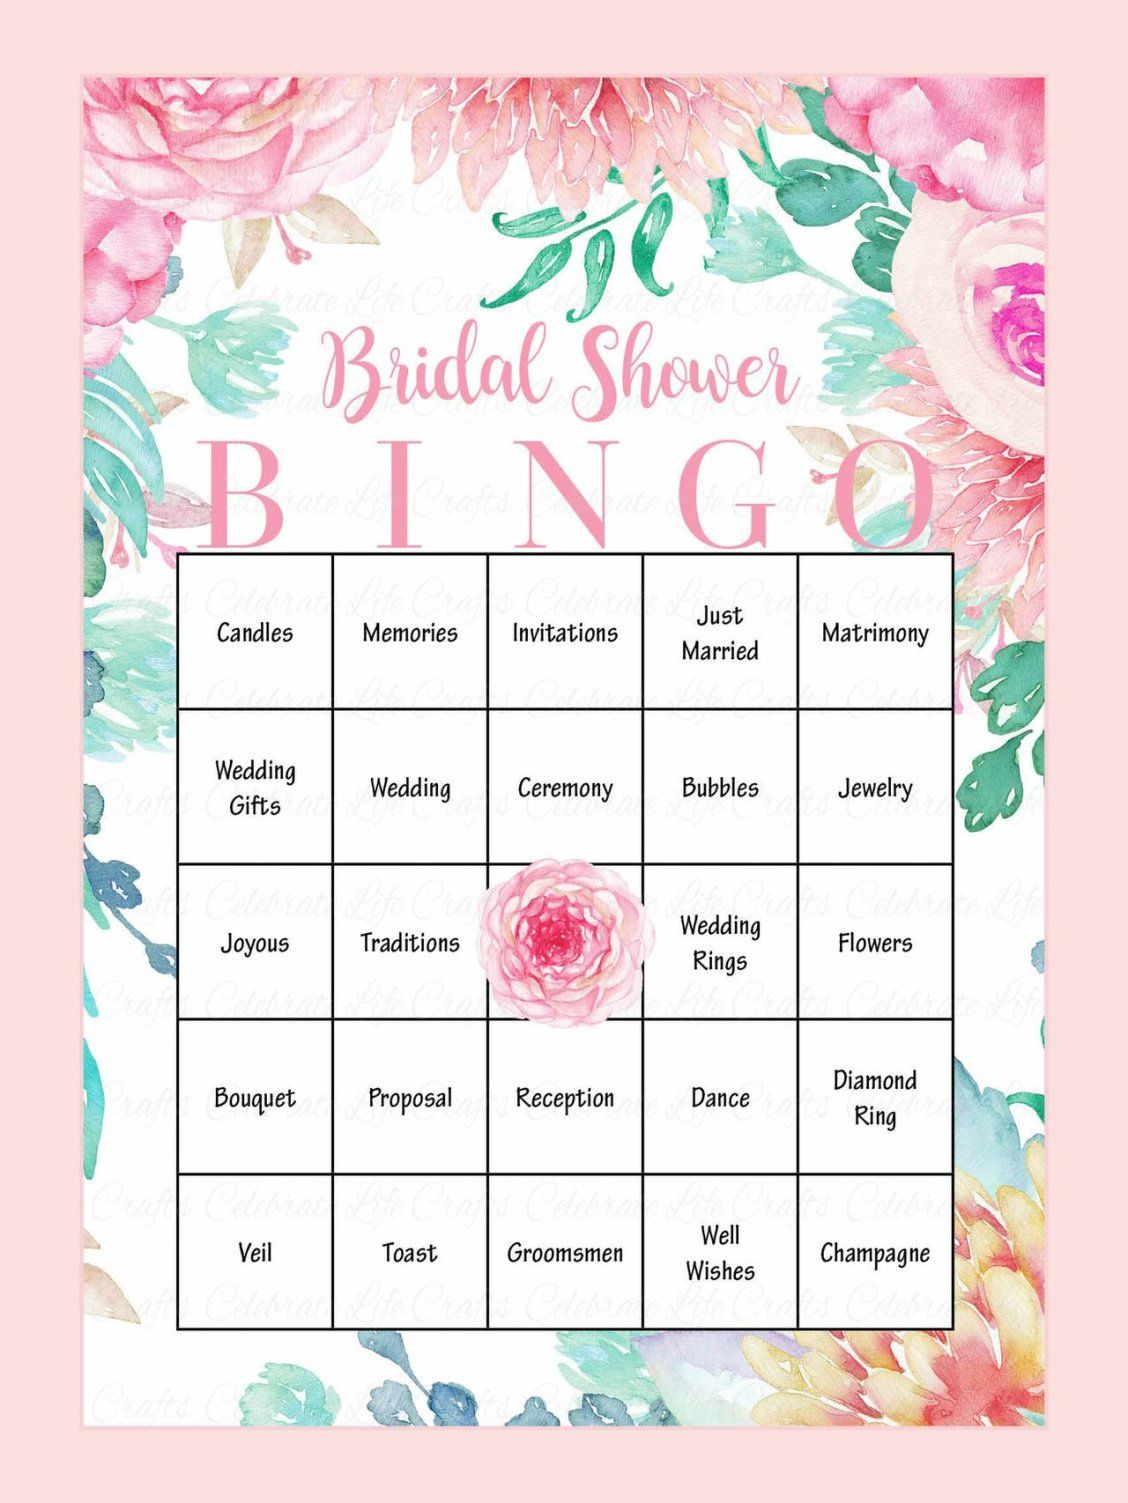 10 Printable Bridal Shower Games You Can Diy